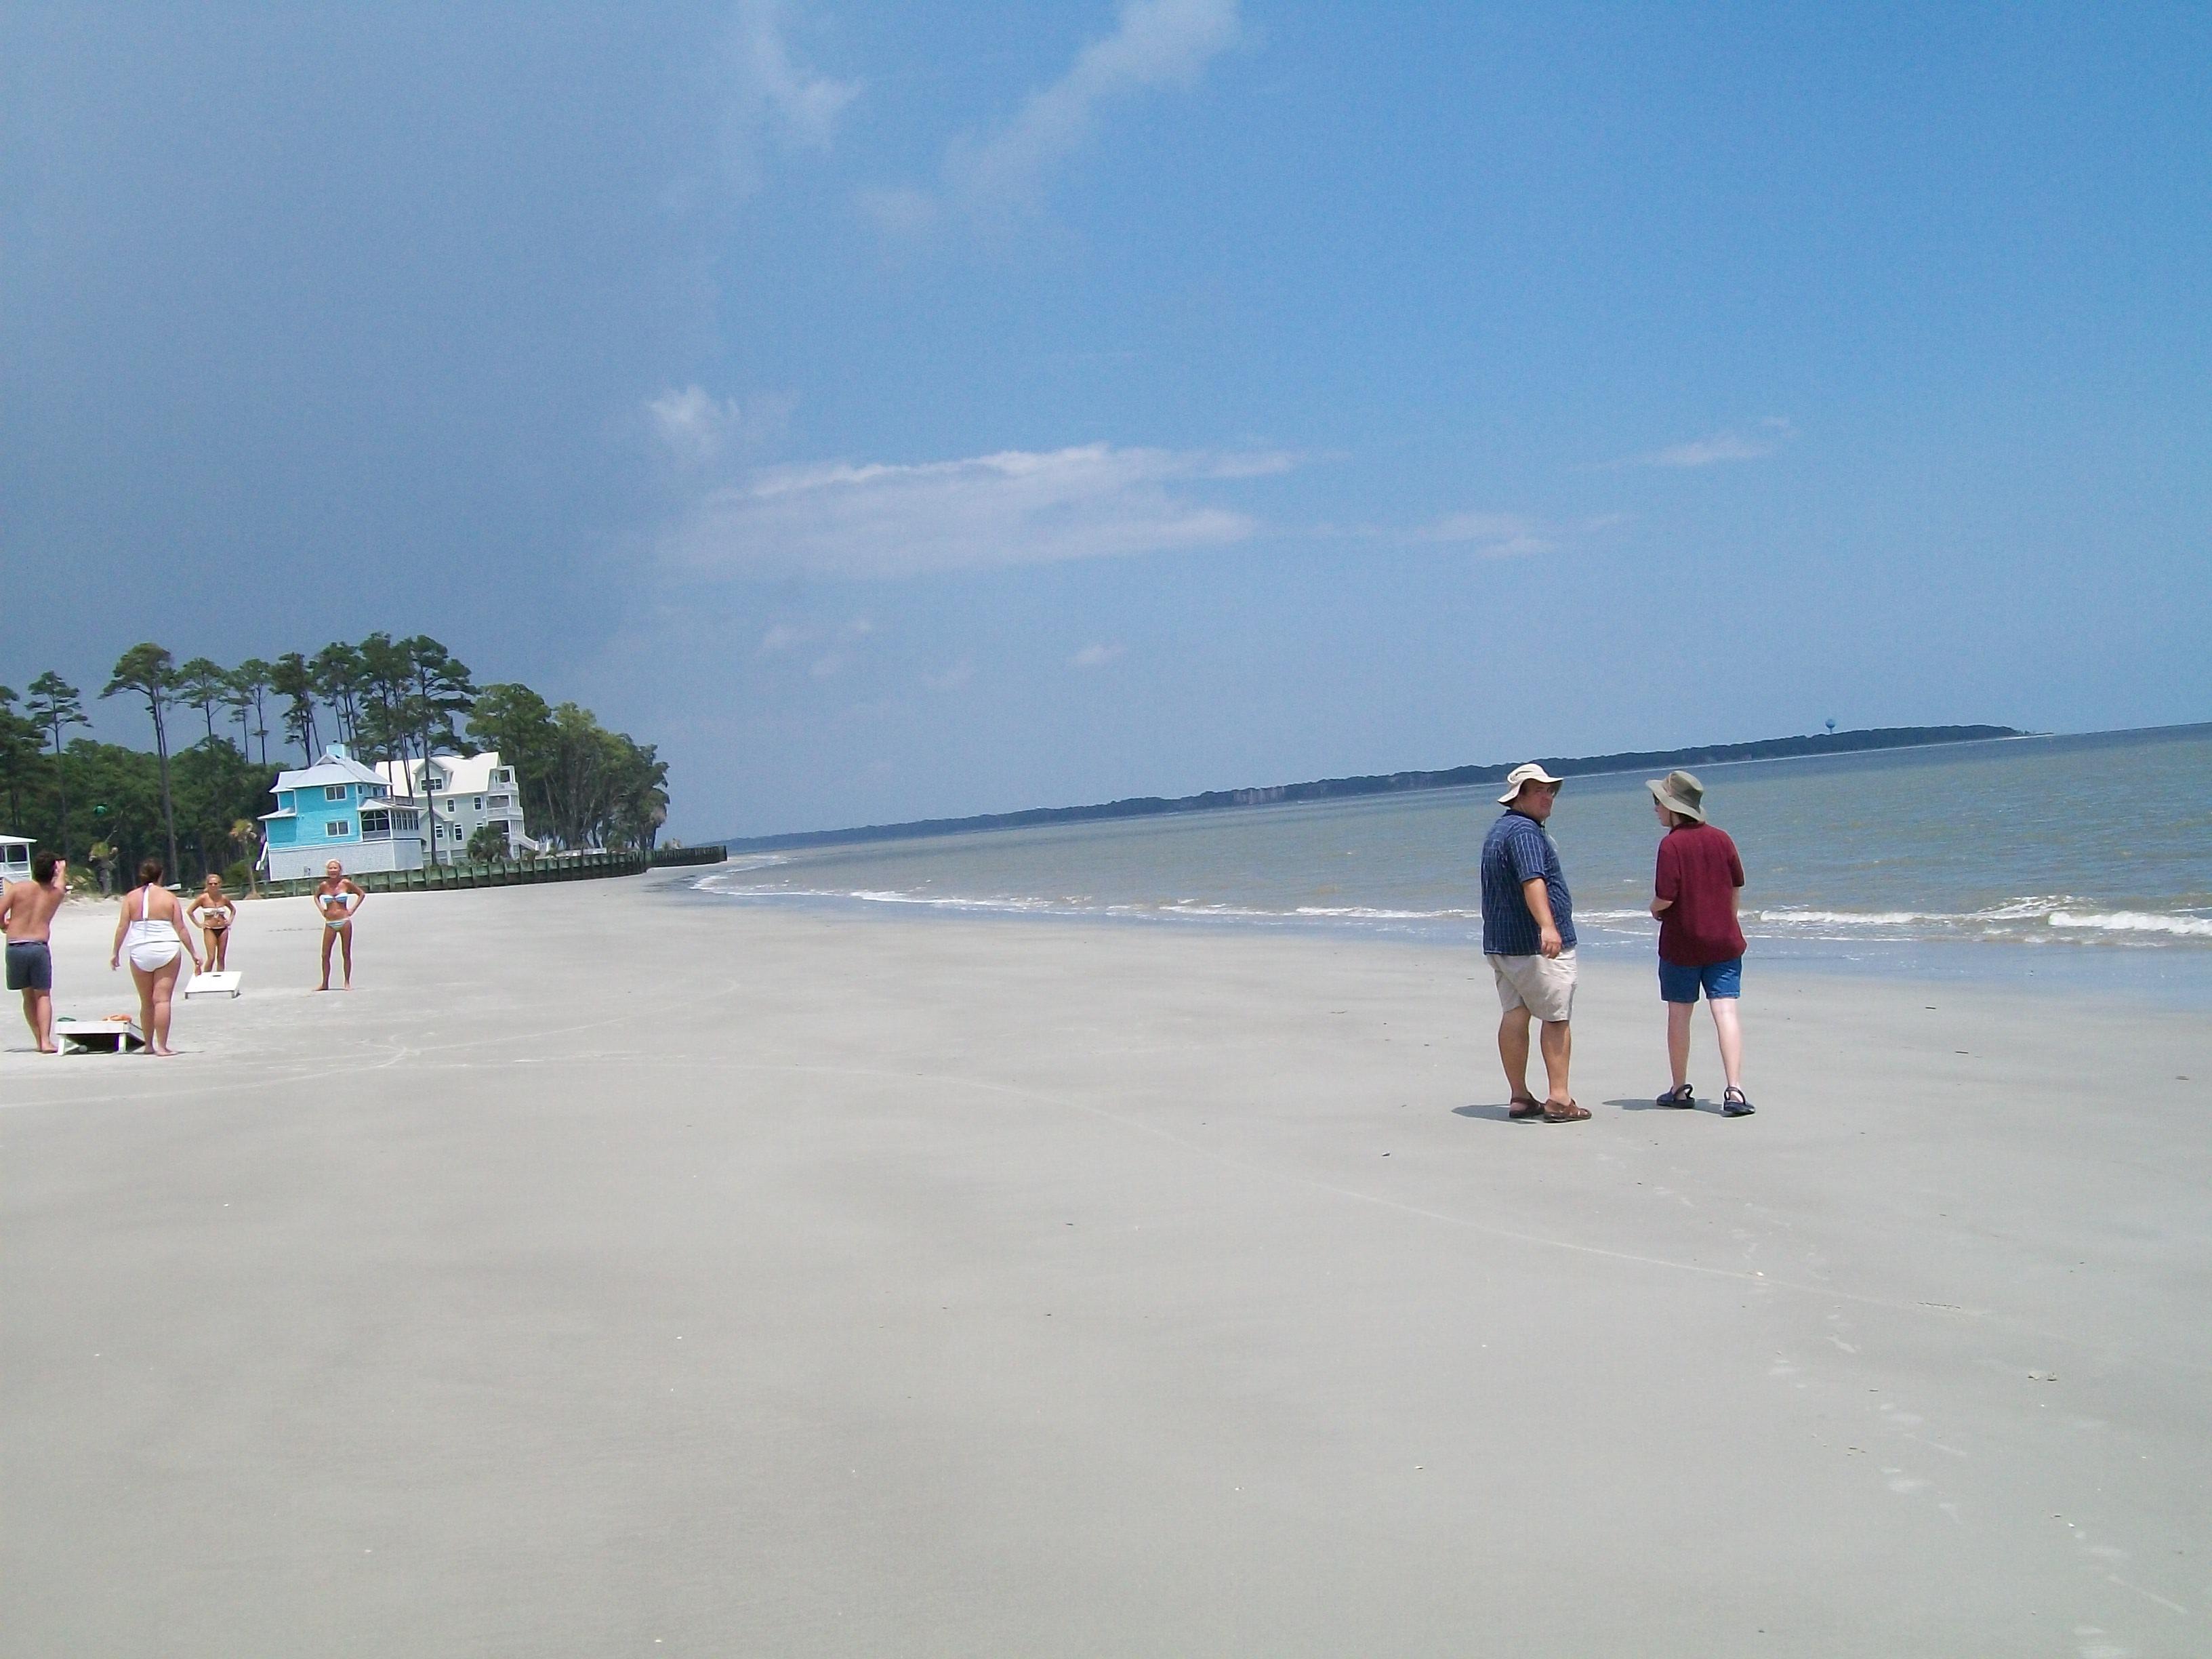 Island dating site